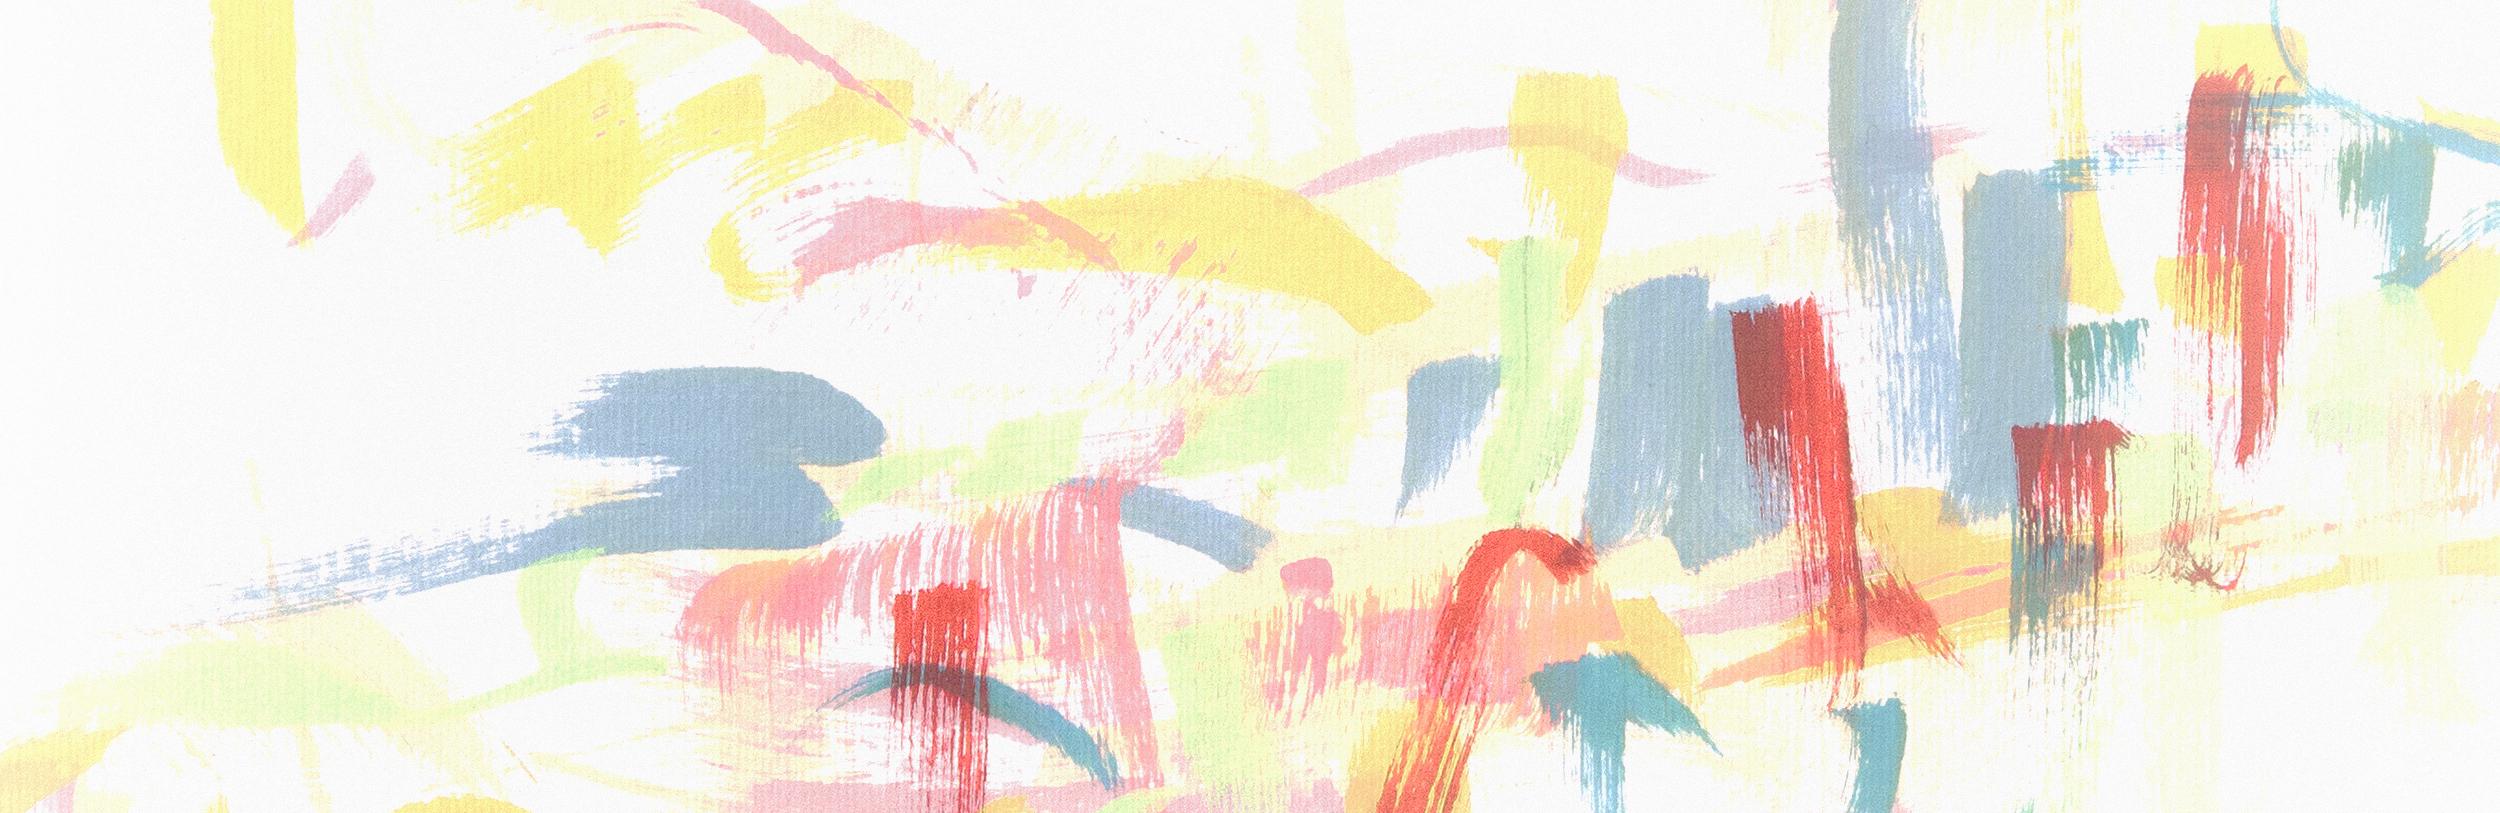 bonjourmolotov+Desniveis+Illustration+Ilustracao+painting+pintura+acrylic+acrílico+canvas+tela+paper+cardboard+mdf+Andre+Gigante+01N5N12.jpg